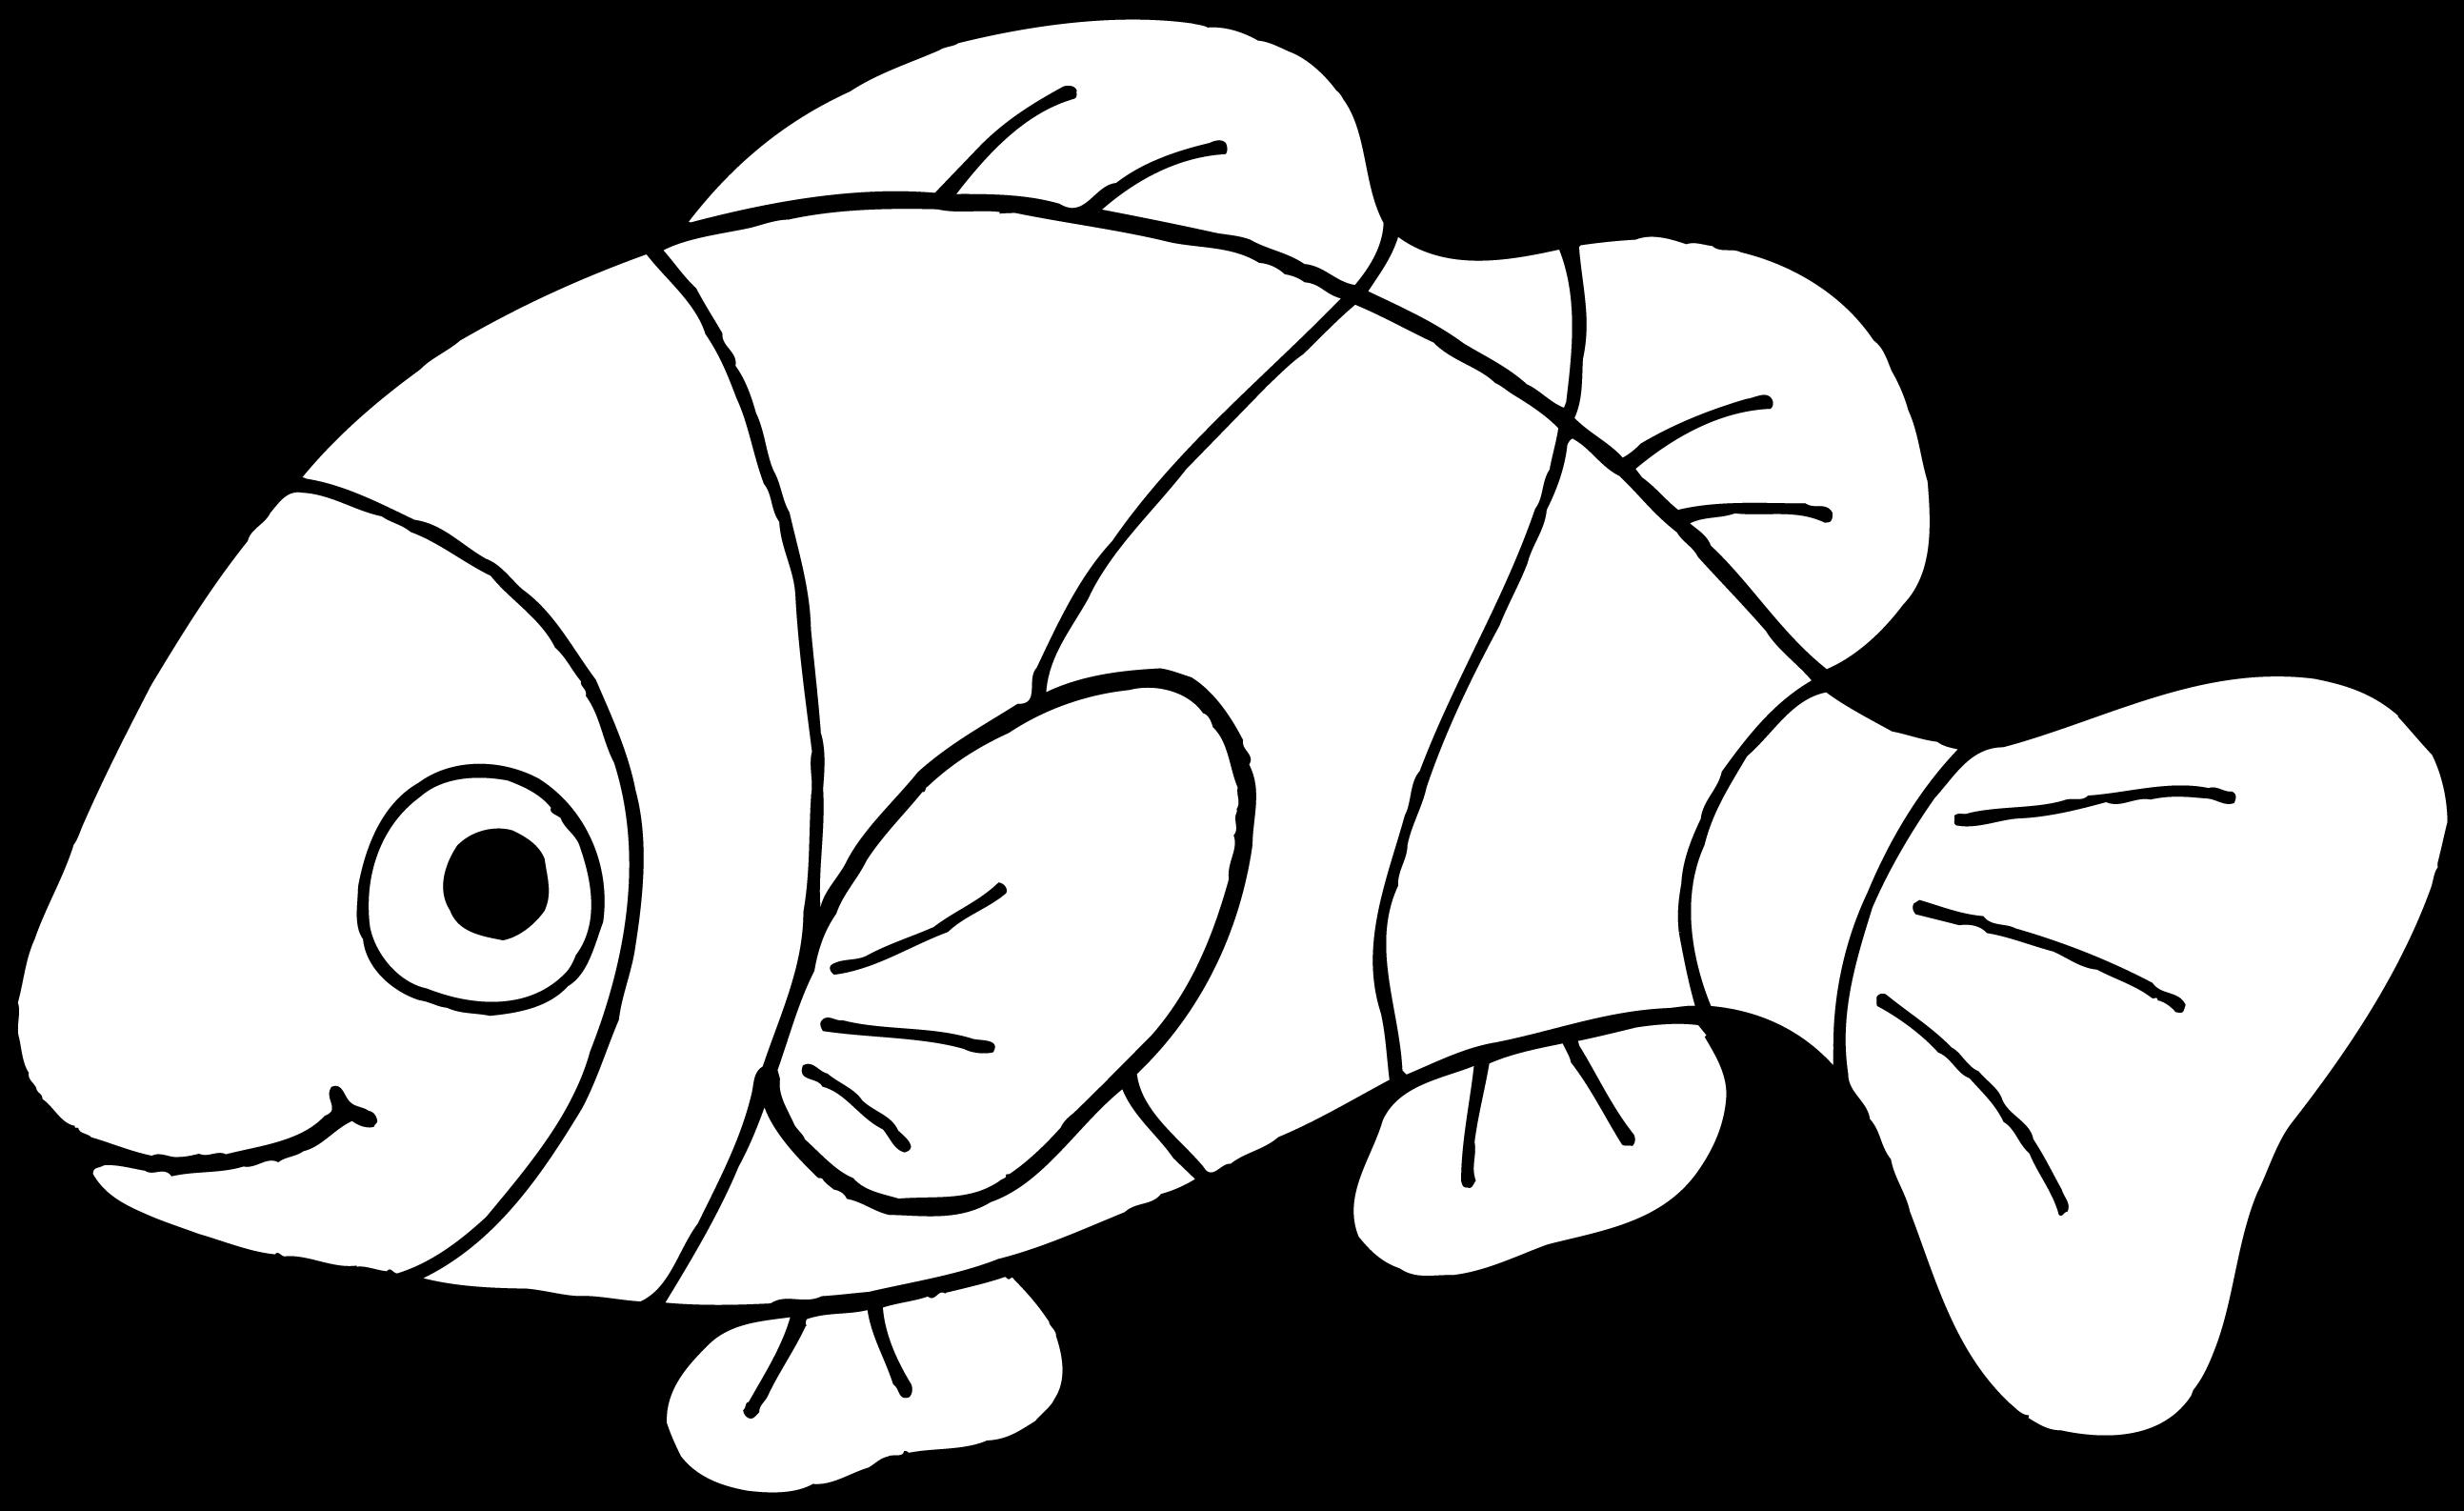 Cartoon fish clipart black and white transparent background image transparent stock Fish black and white image clipart images gallery for free download ... image transparent stock